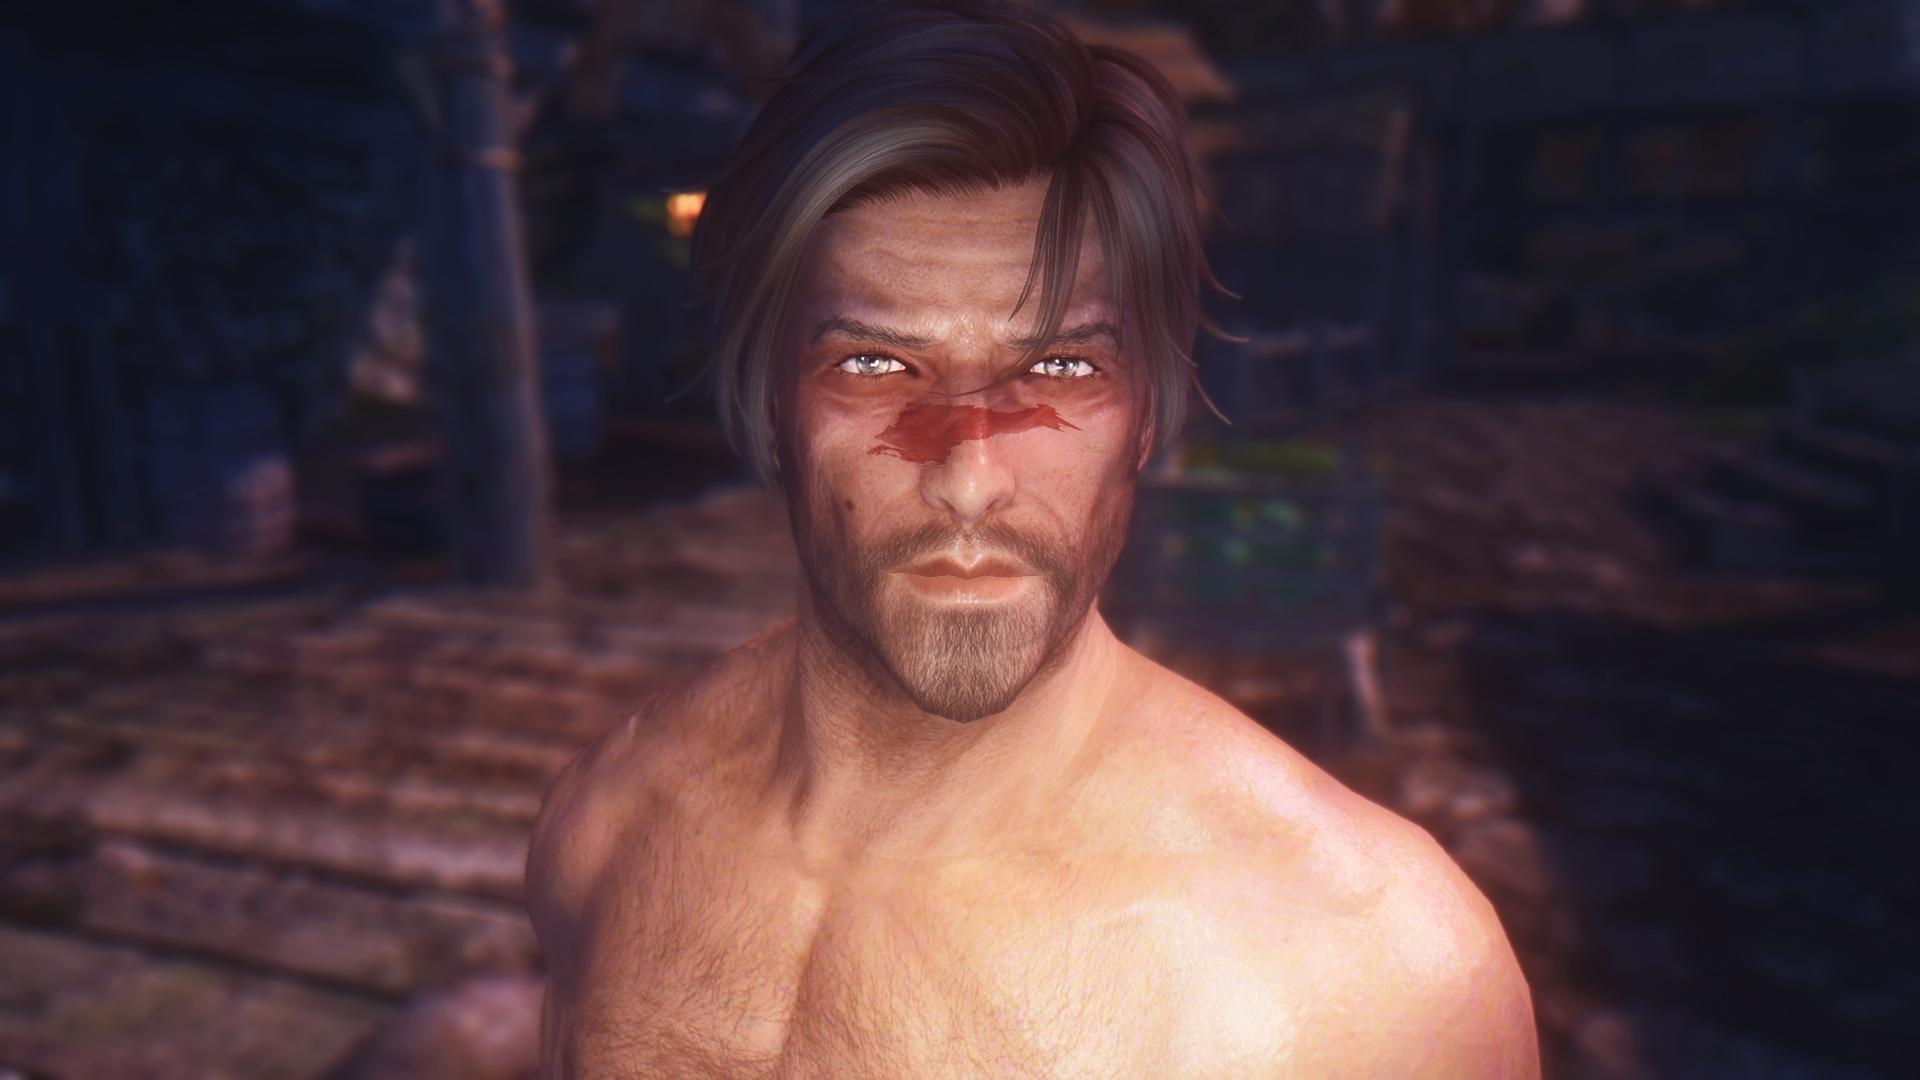 Most Beautiful Man in Skyrim - Tannick Standalone Follower